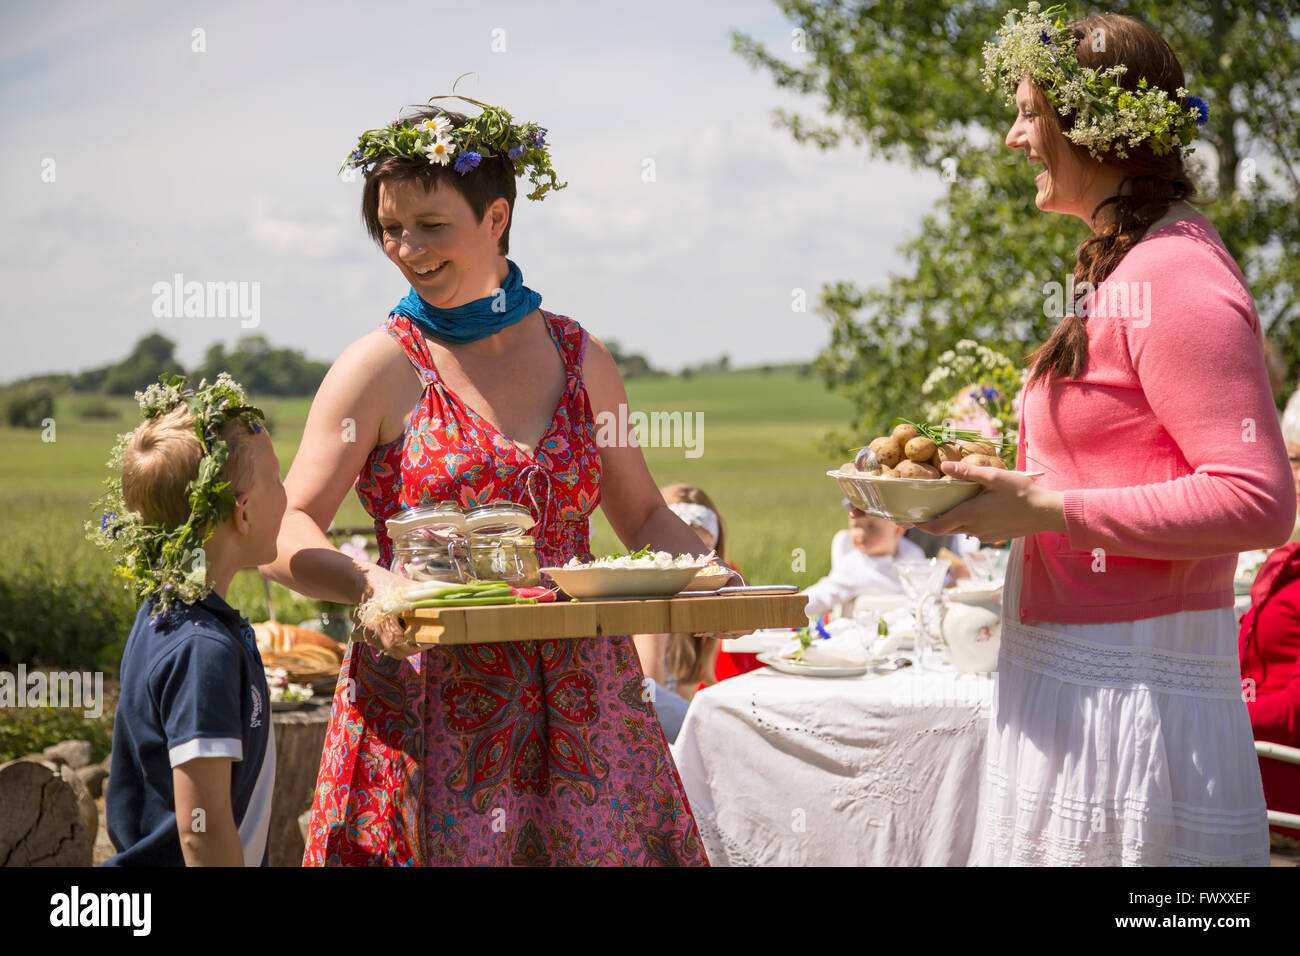 Sweden, Skane, Mother talking with children (6-7, 8-9) during festival - Stock Image